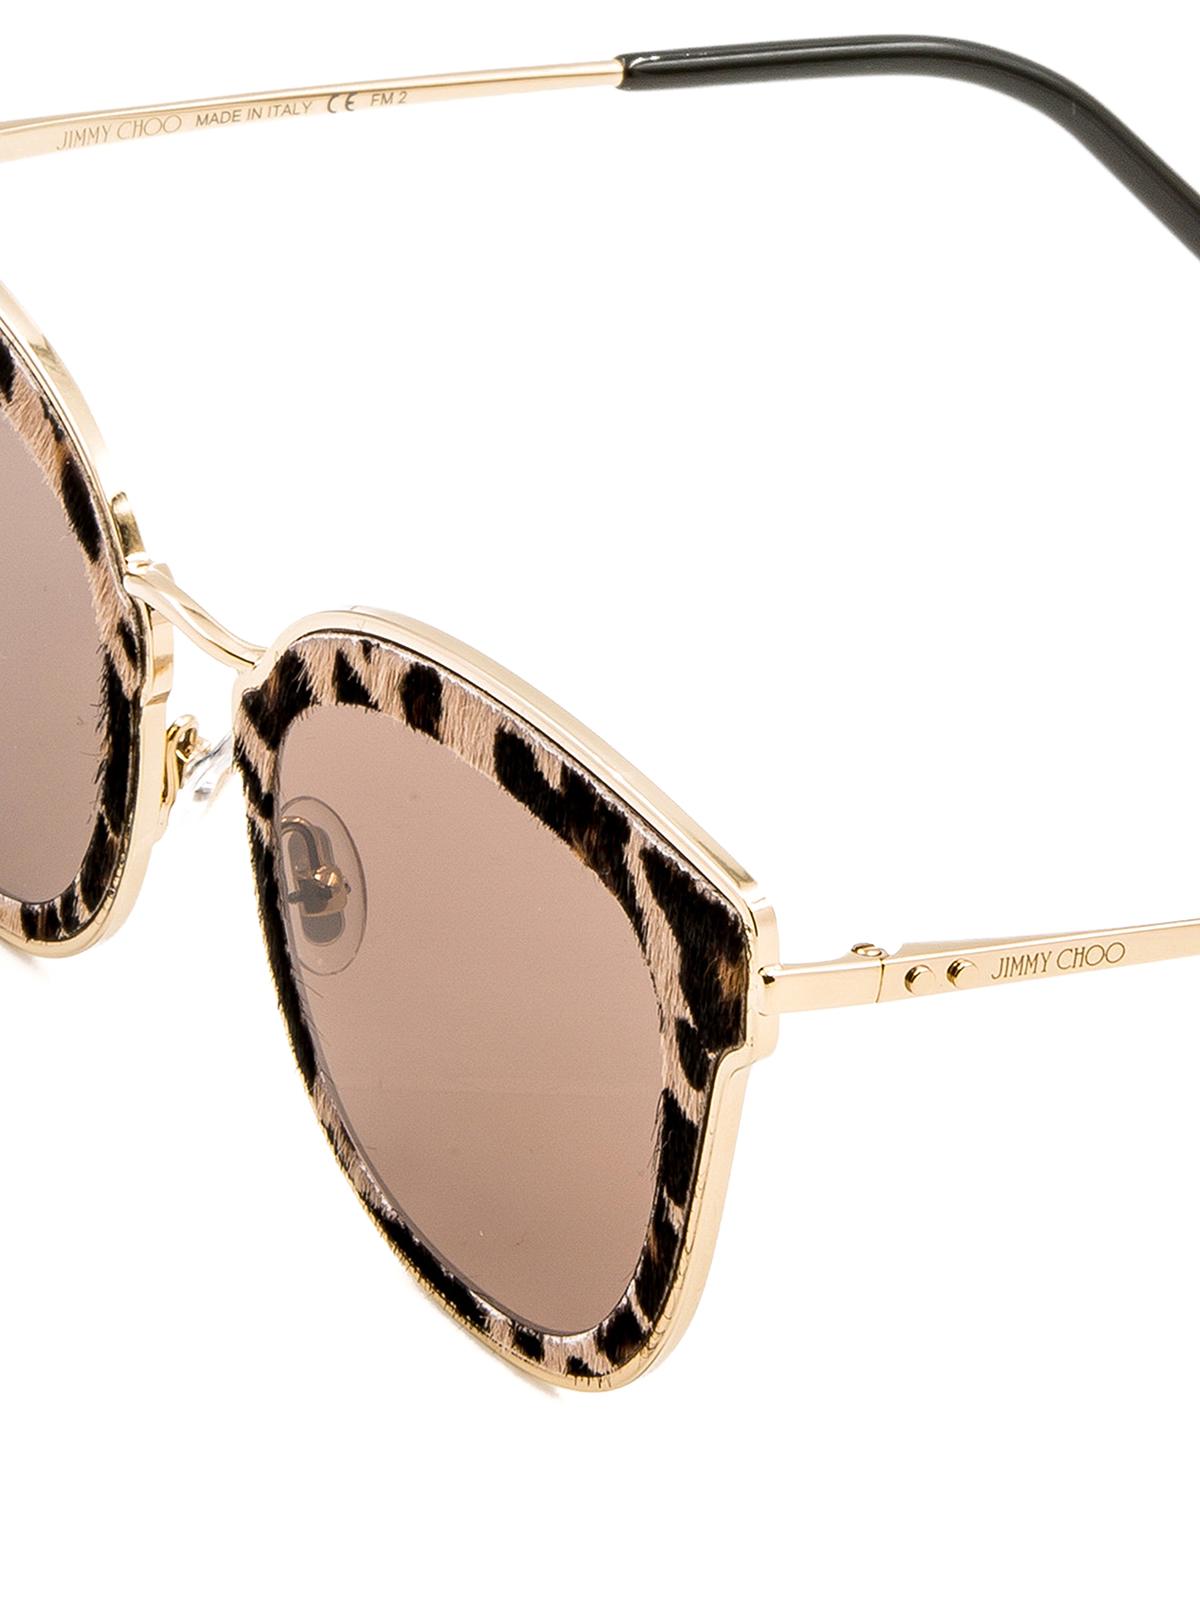 2de7c35e6c2 Jimmy Choo - Niles haircalf cat eye sunglasses - sunglasses - NILESXMG2M